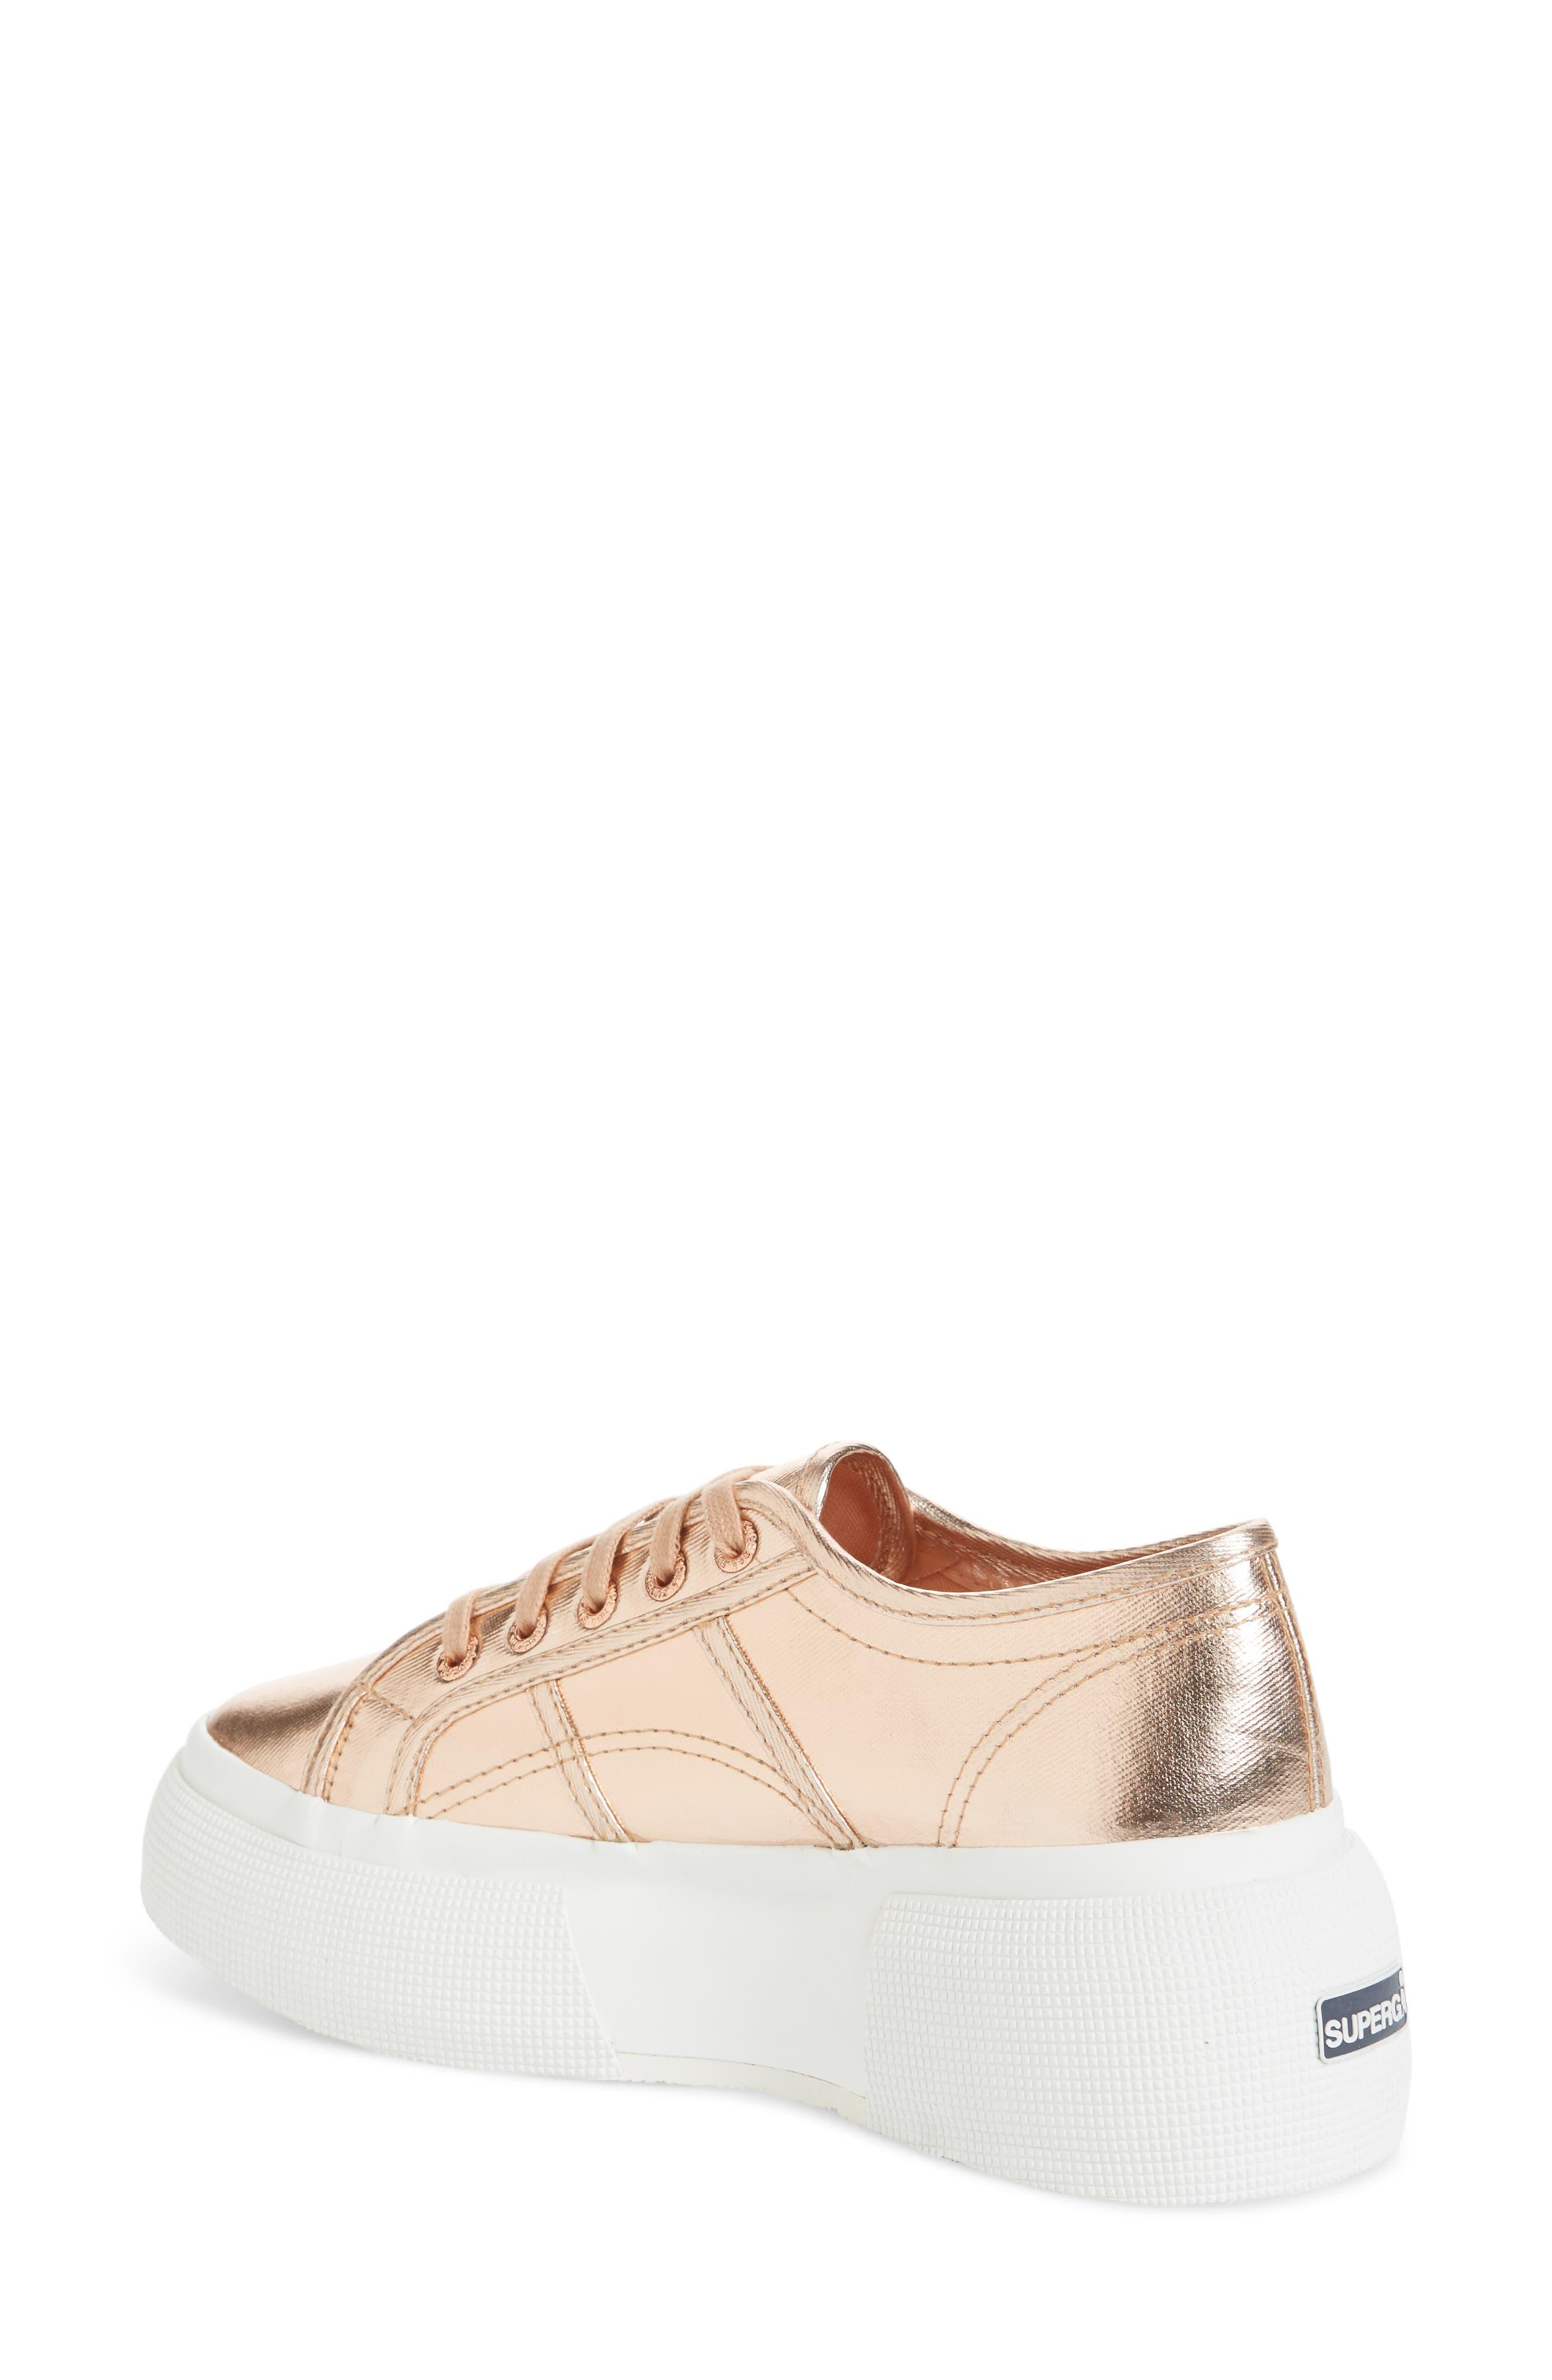 2287 Cotu Platform Sneaker,                             Alternate thumbnail 4, color,